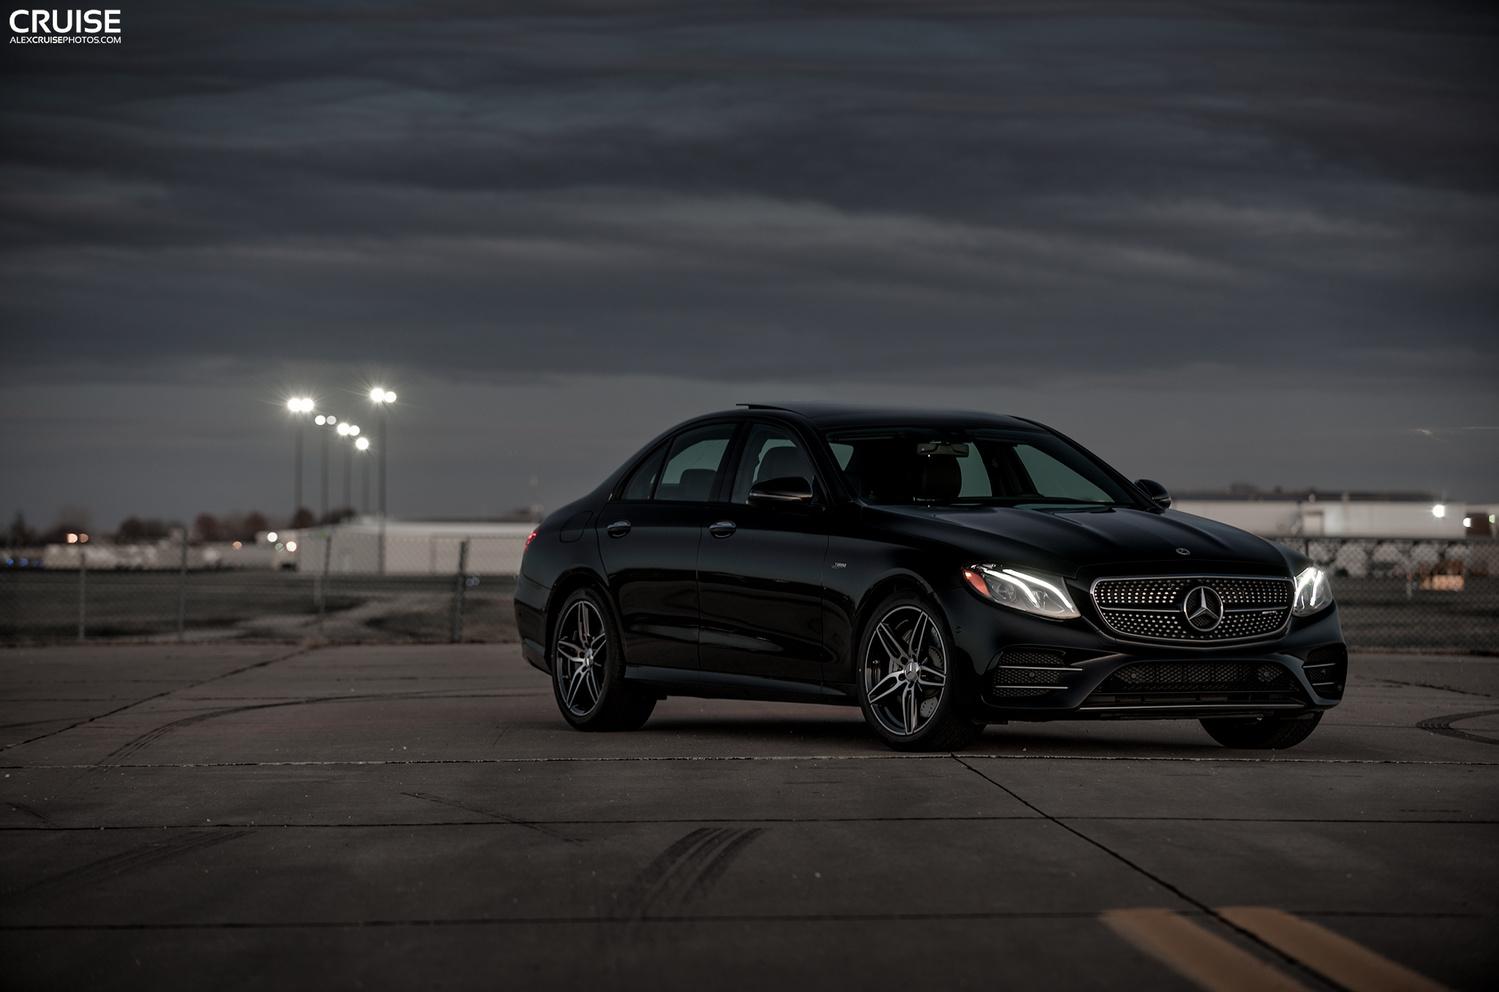 Mercedes E53 AMG by Alex Cruise